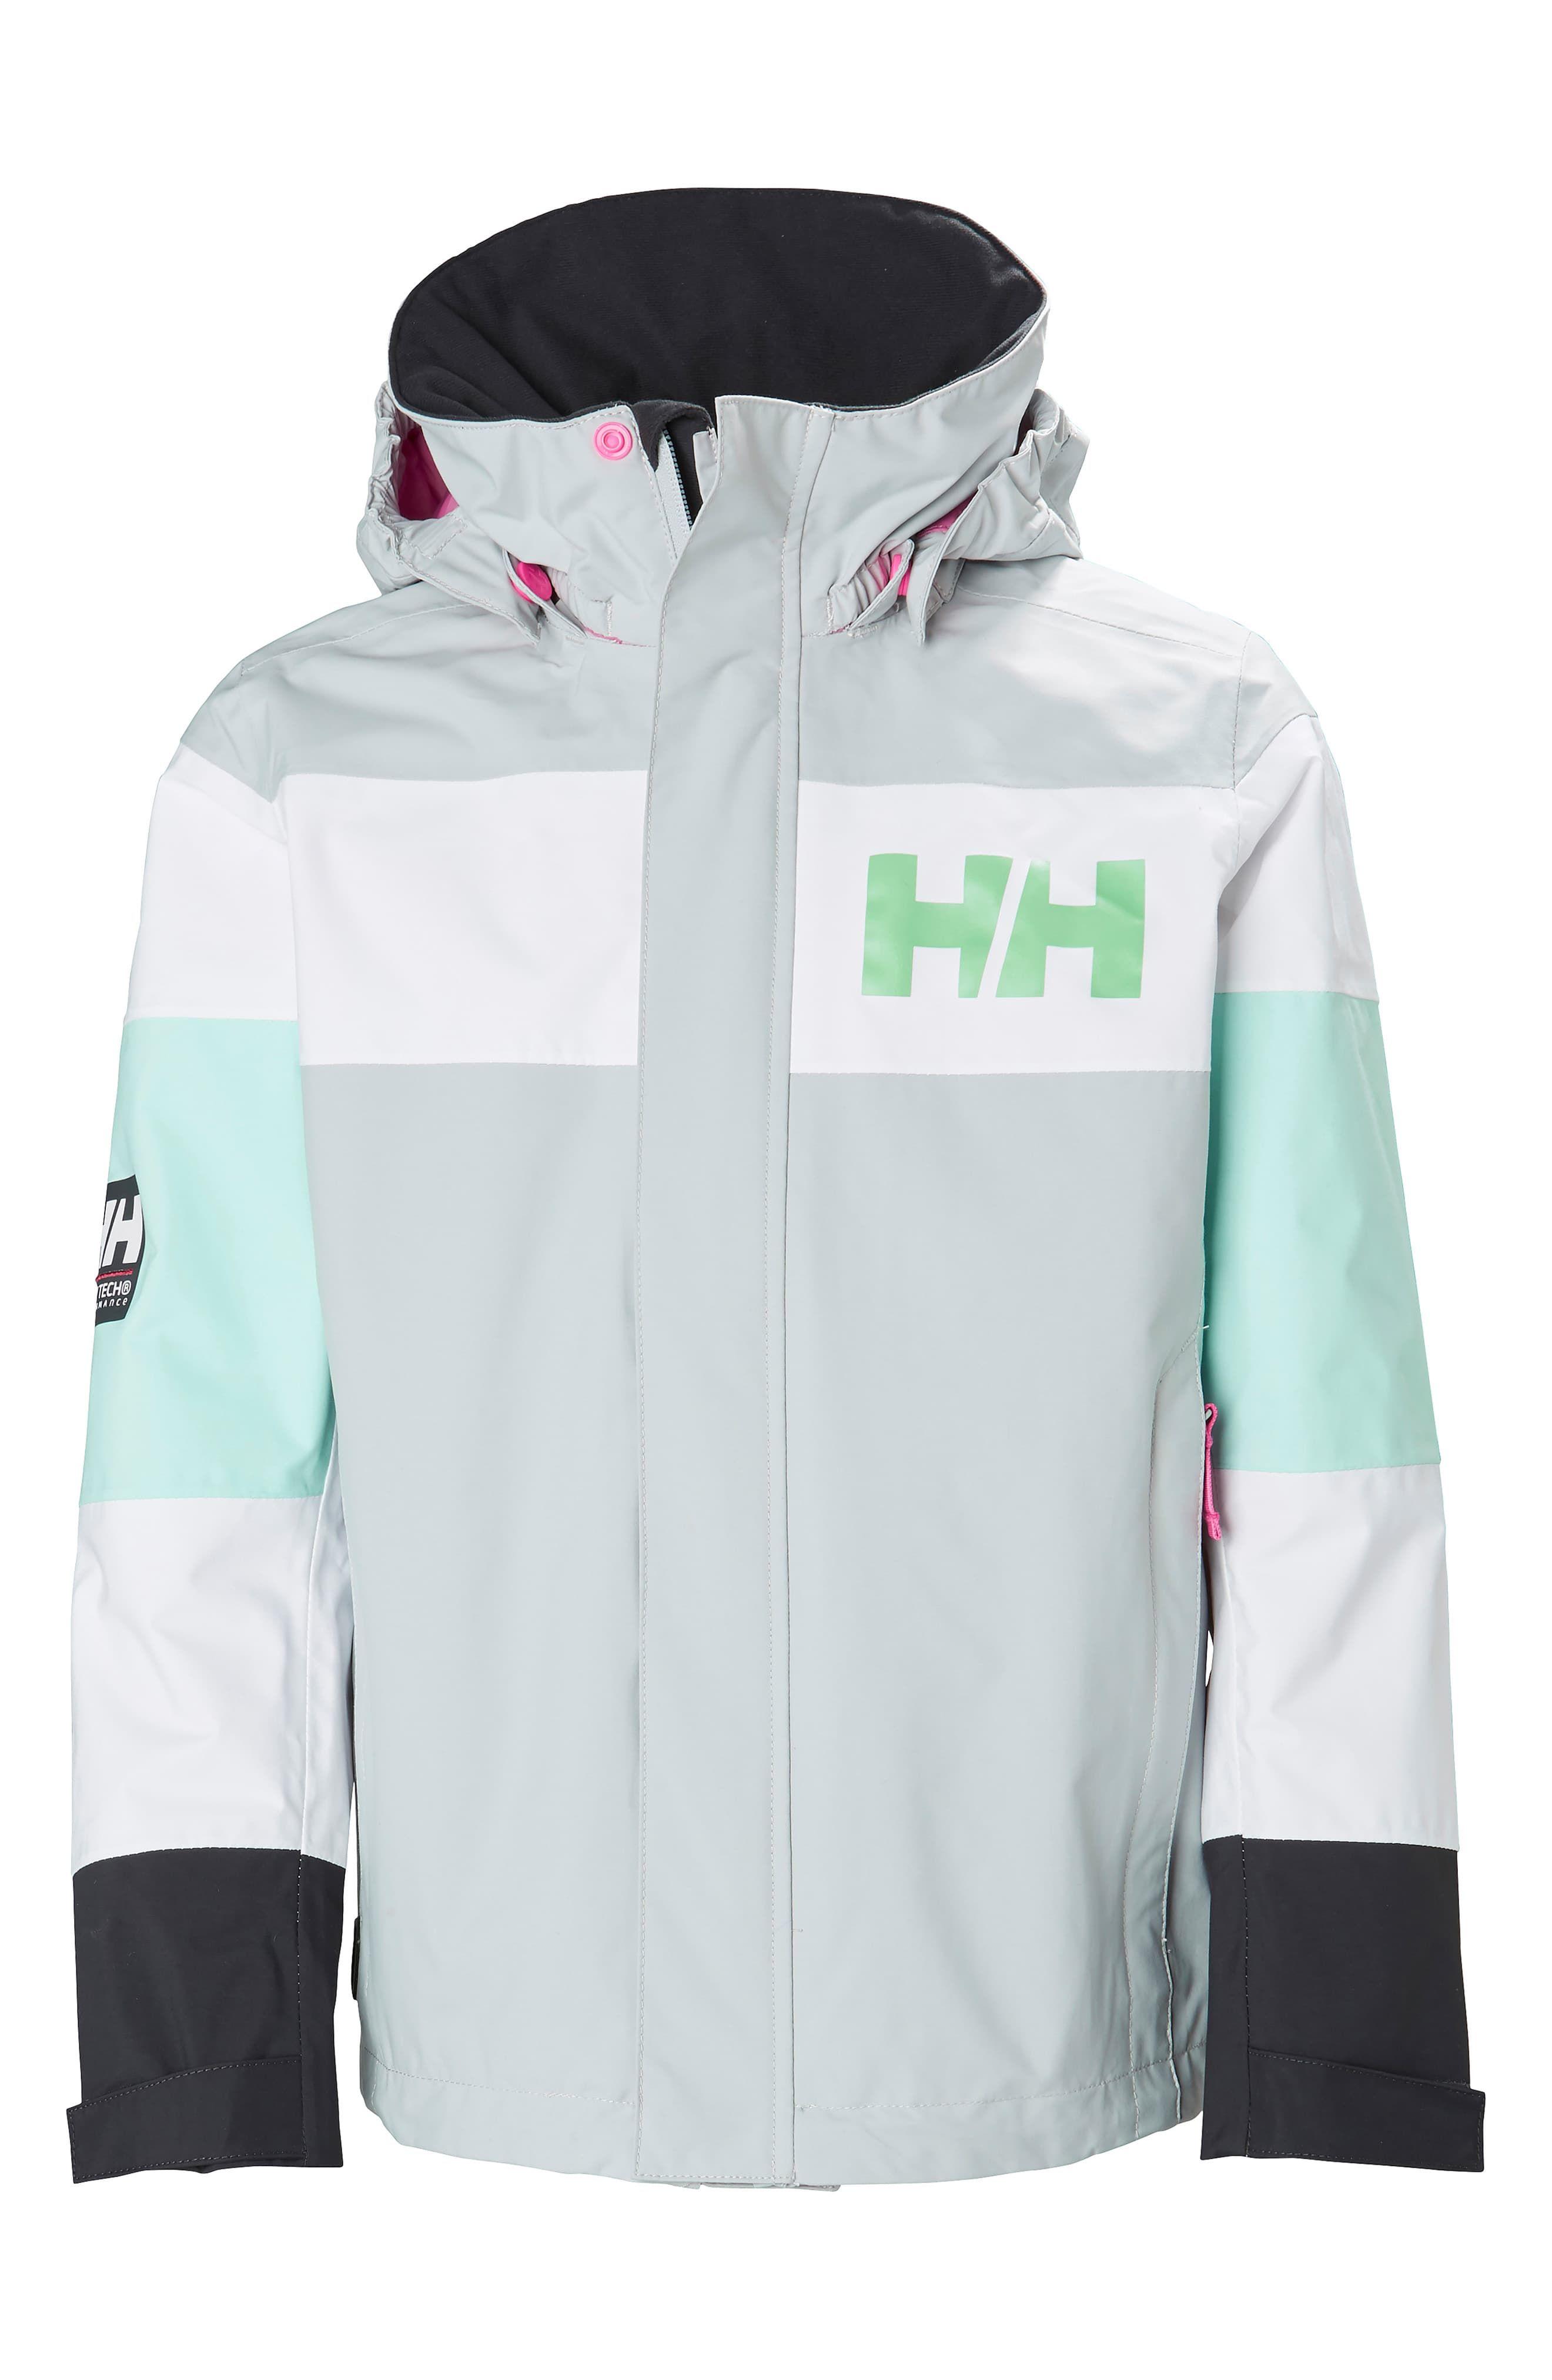 28af396f Boy's Helly Hansen Salt Port Waterproof Jacket, Size 10 - Grey ...